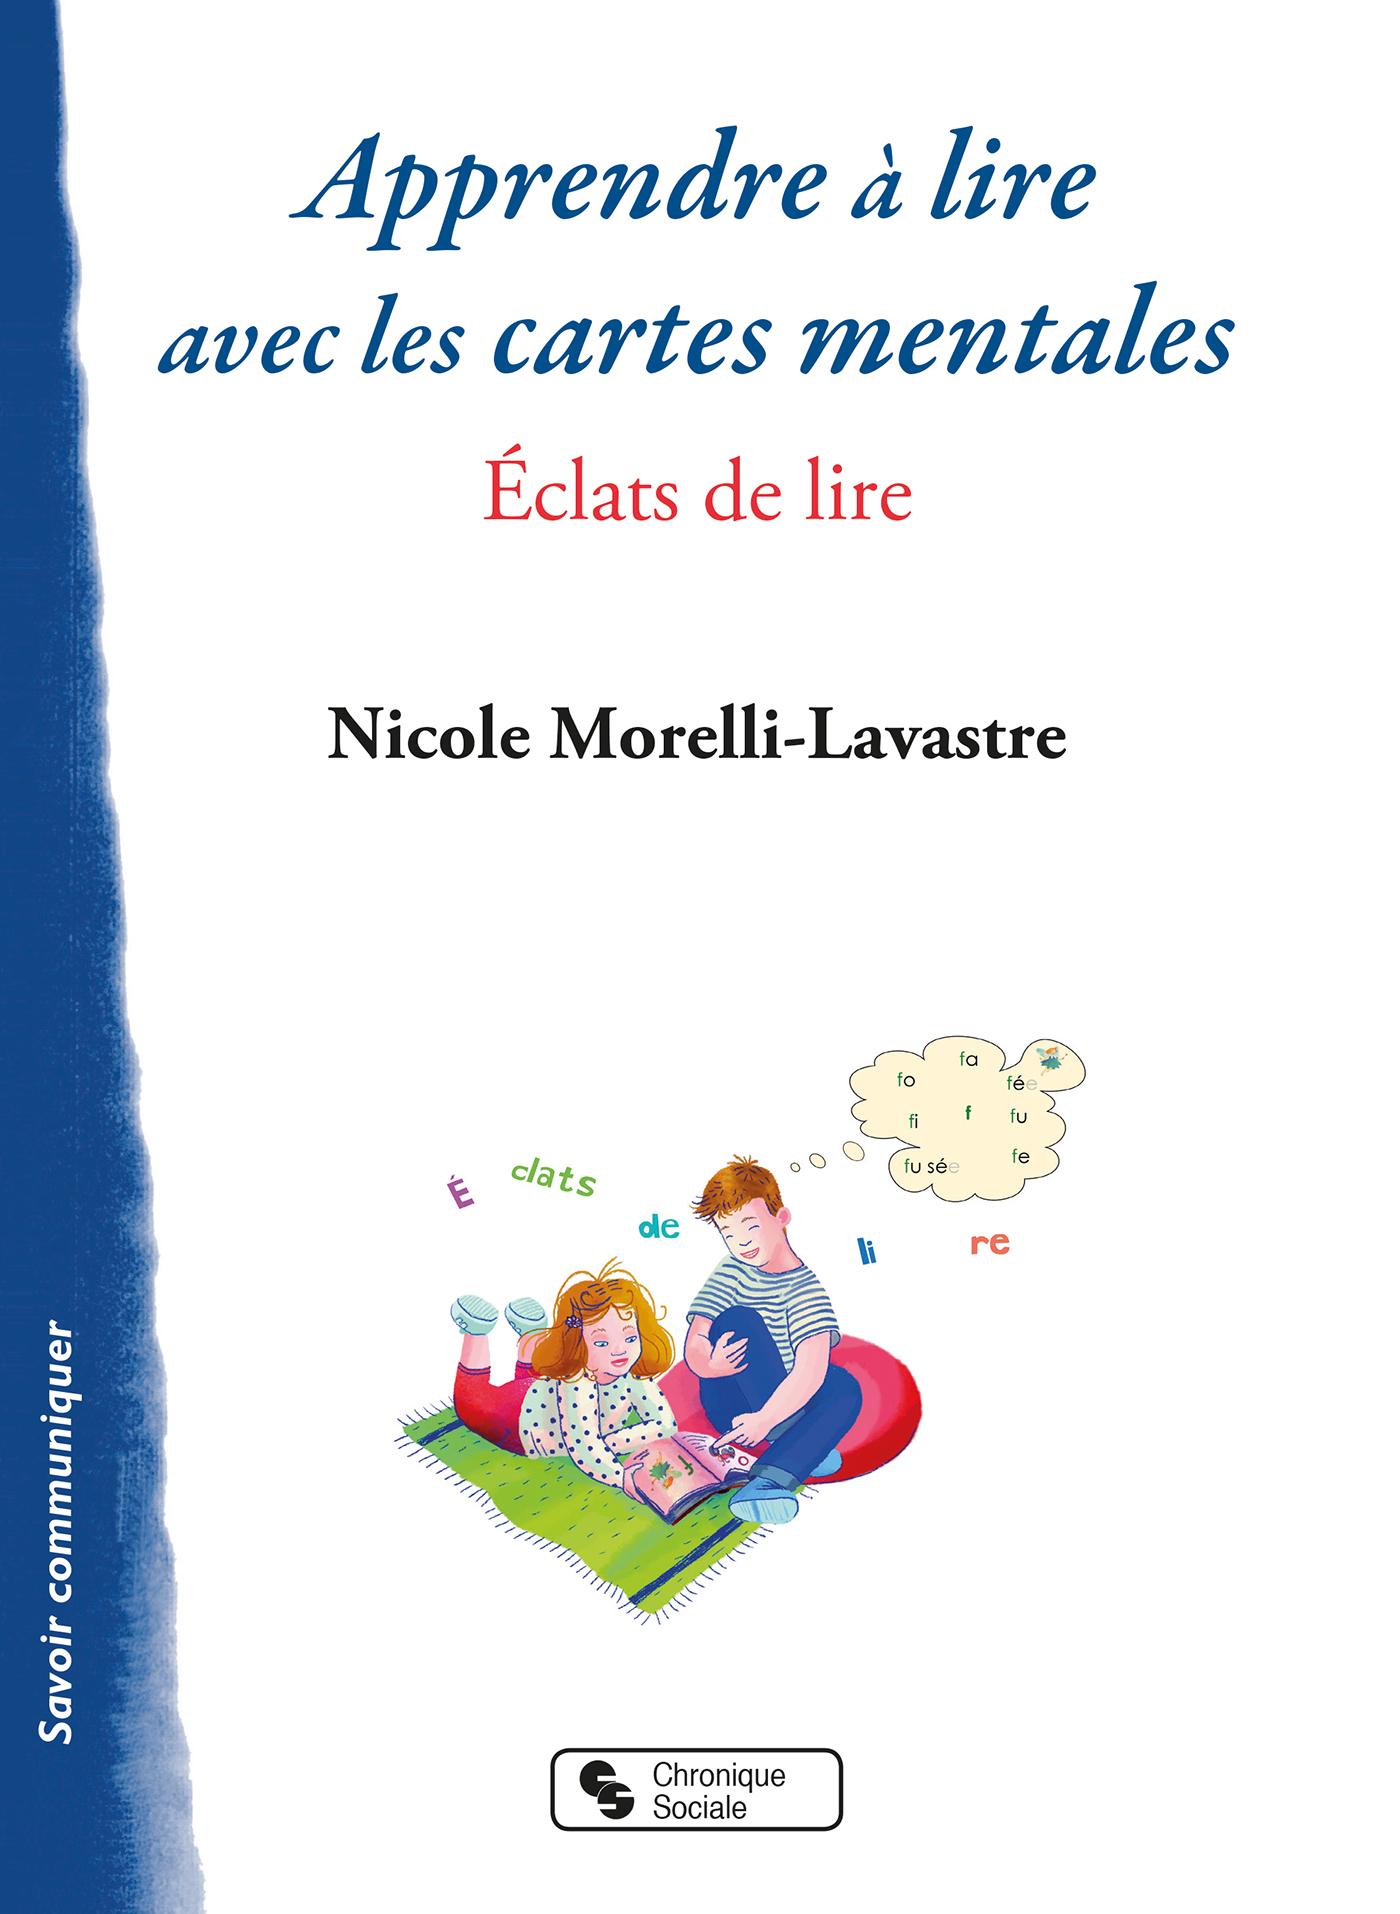 APPRENDRE A LIRE AVEC LES CARTES MENTALES - ECLATS DE LIRE